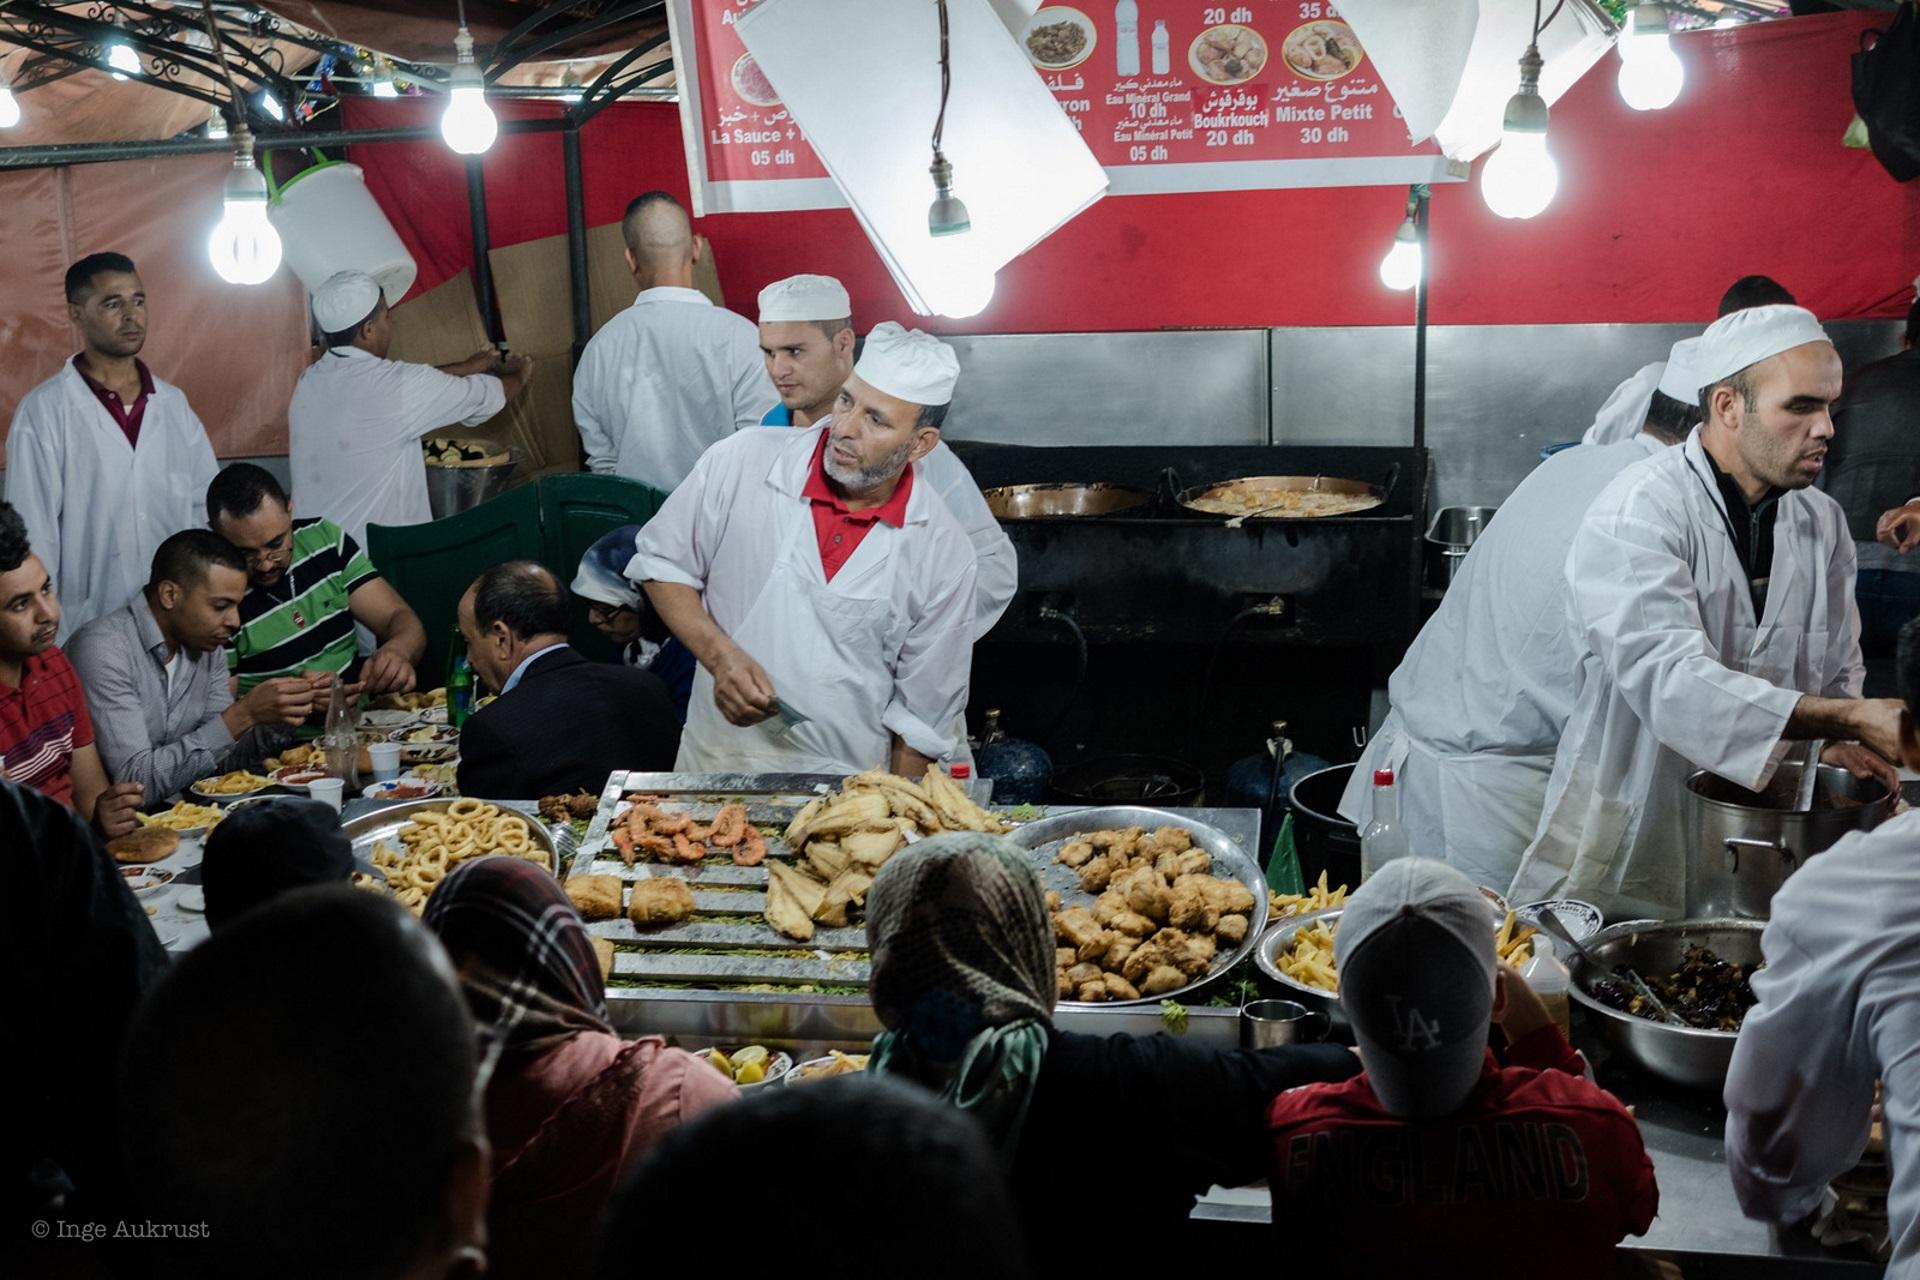 marrakech2-photo-inge-aukrust-kopiweb